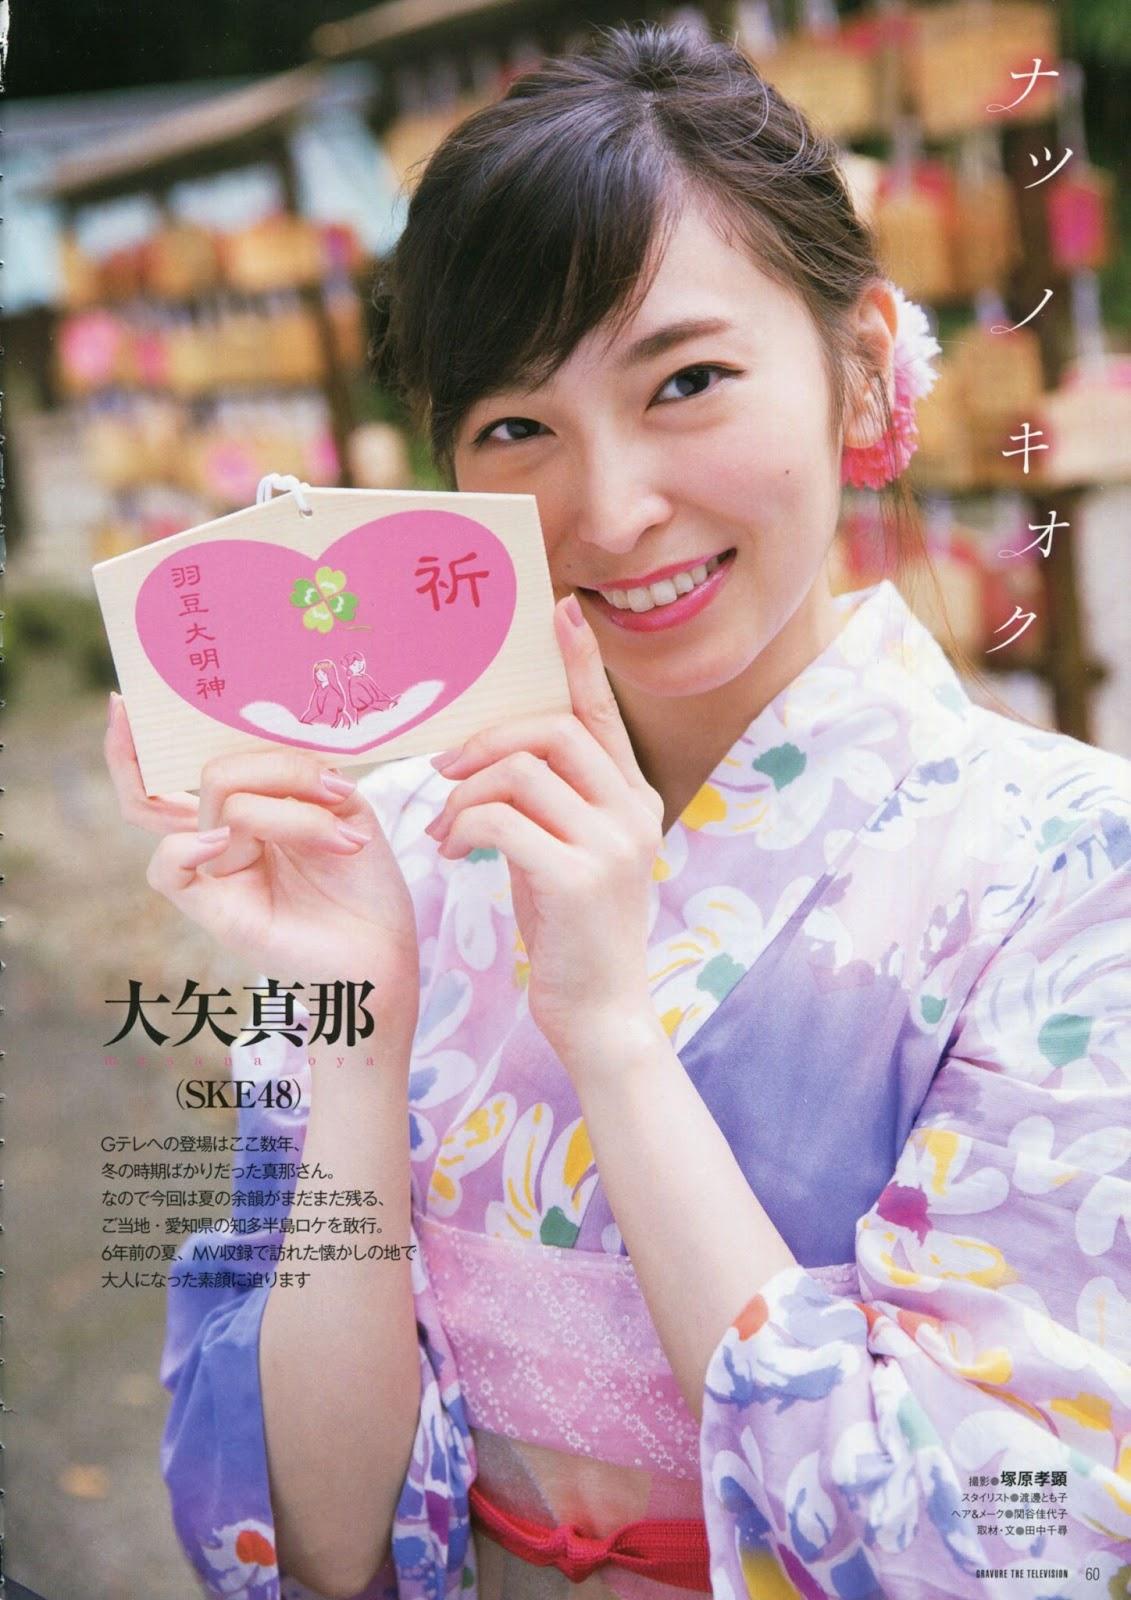 Oya Masana 大矢真那, Gravure The Television 2017 Vol.48 (G(グラビア)ザテレビジョン) Vol.84)